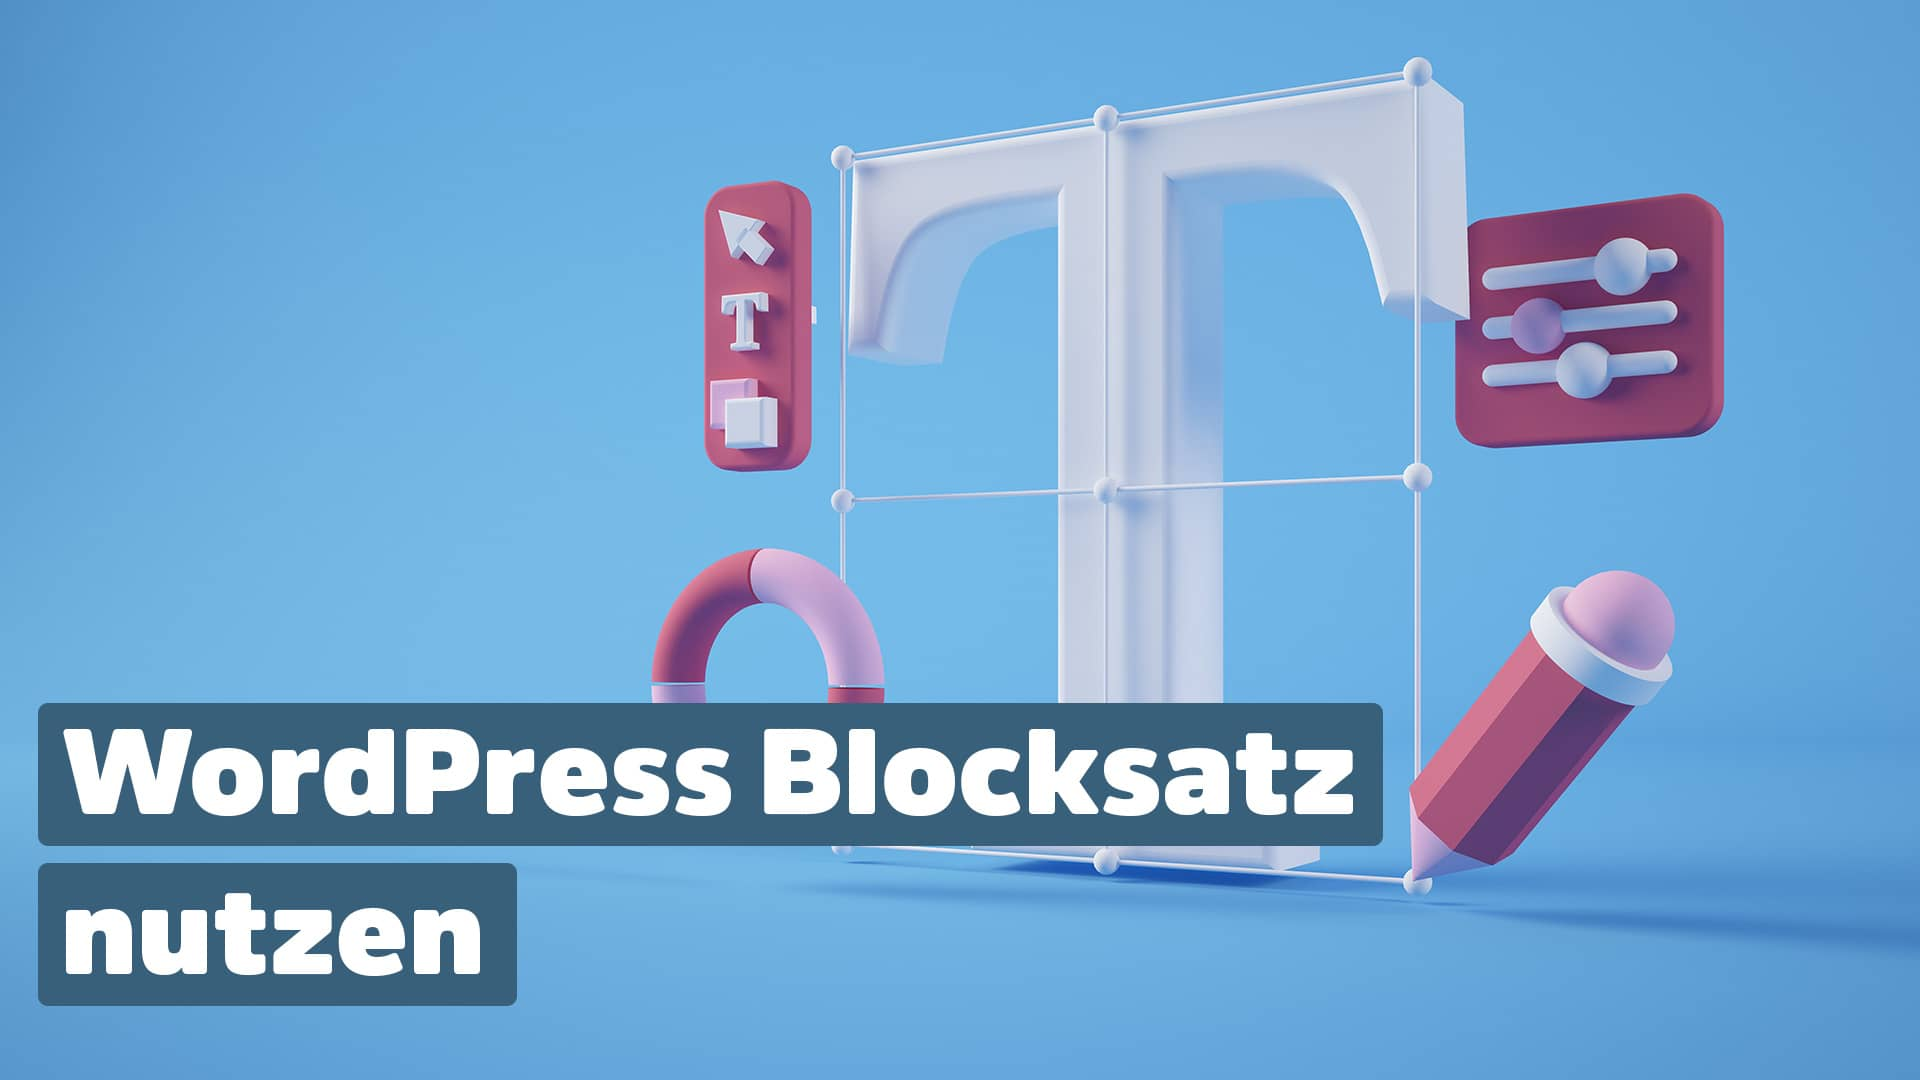 WordPress Blocksatz